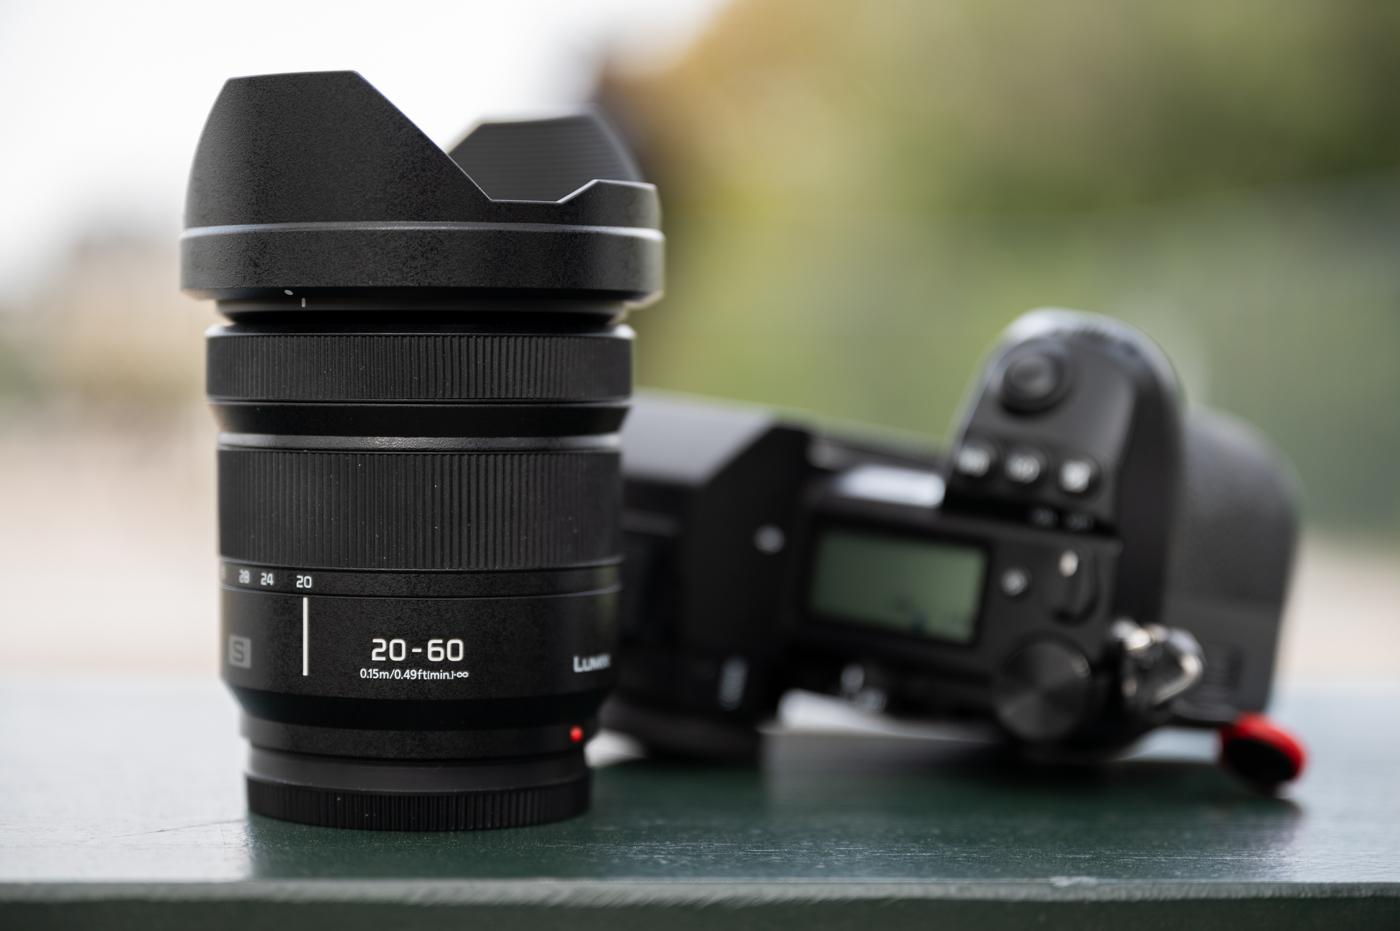 Test Phototrend Panasonic Lumix 20 60 mm f/3,5-5,6